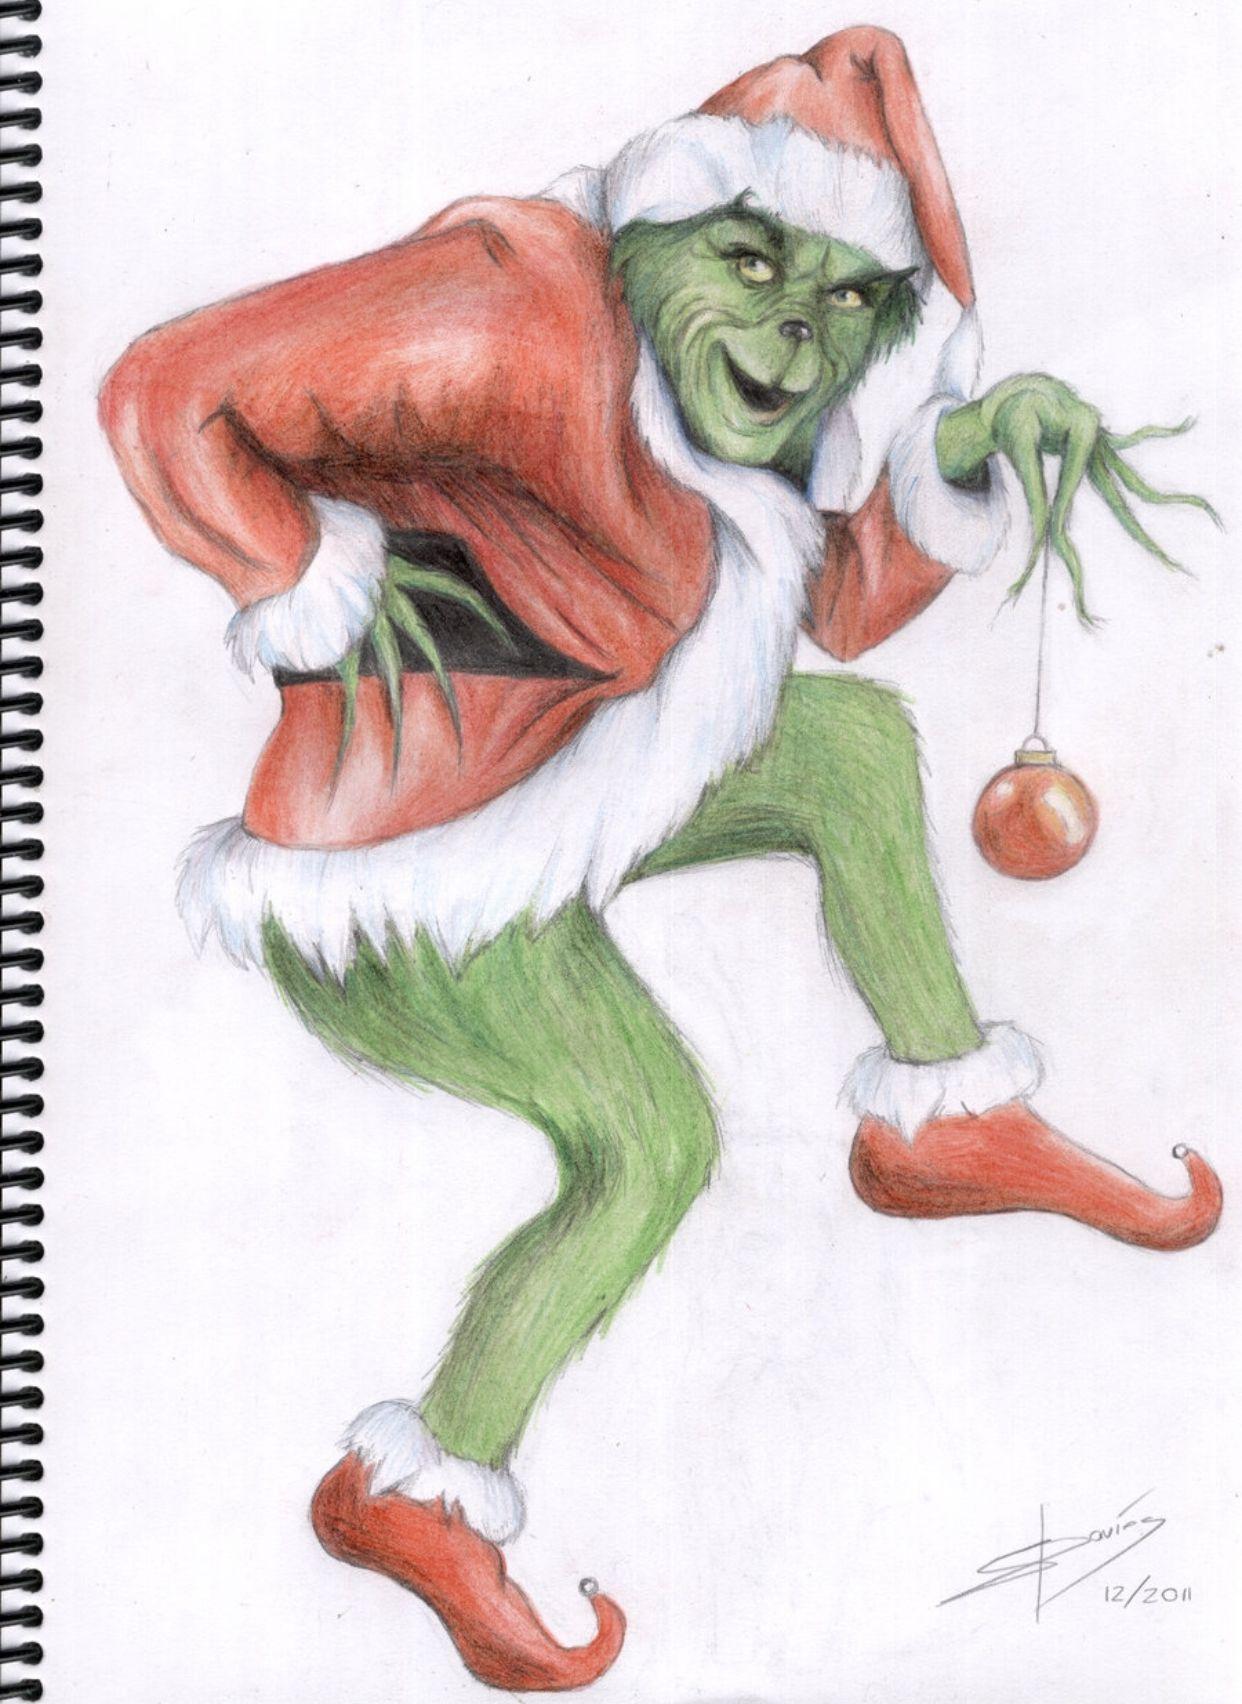 Pin De Lara Draws En Colored Art Dibujo De Navidad Arte De Navidad Dibujos